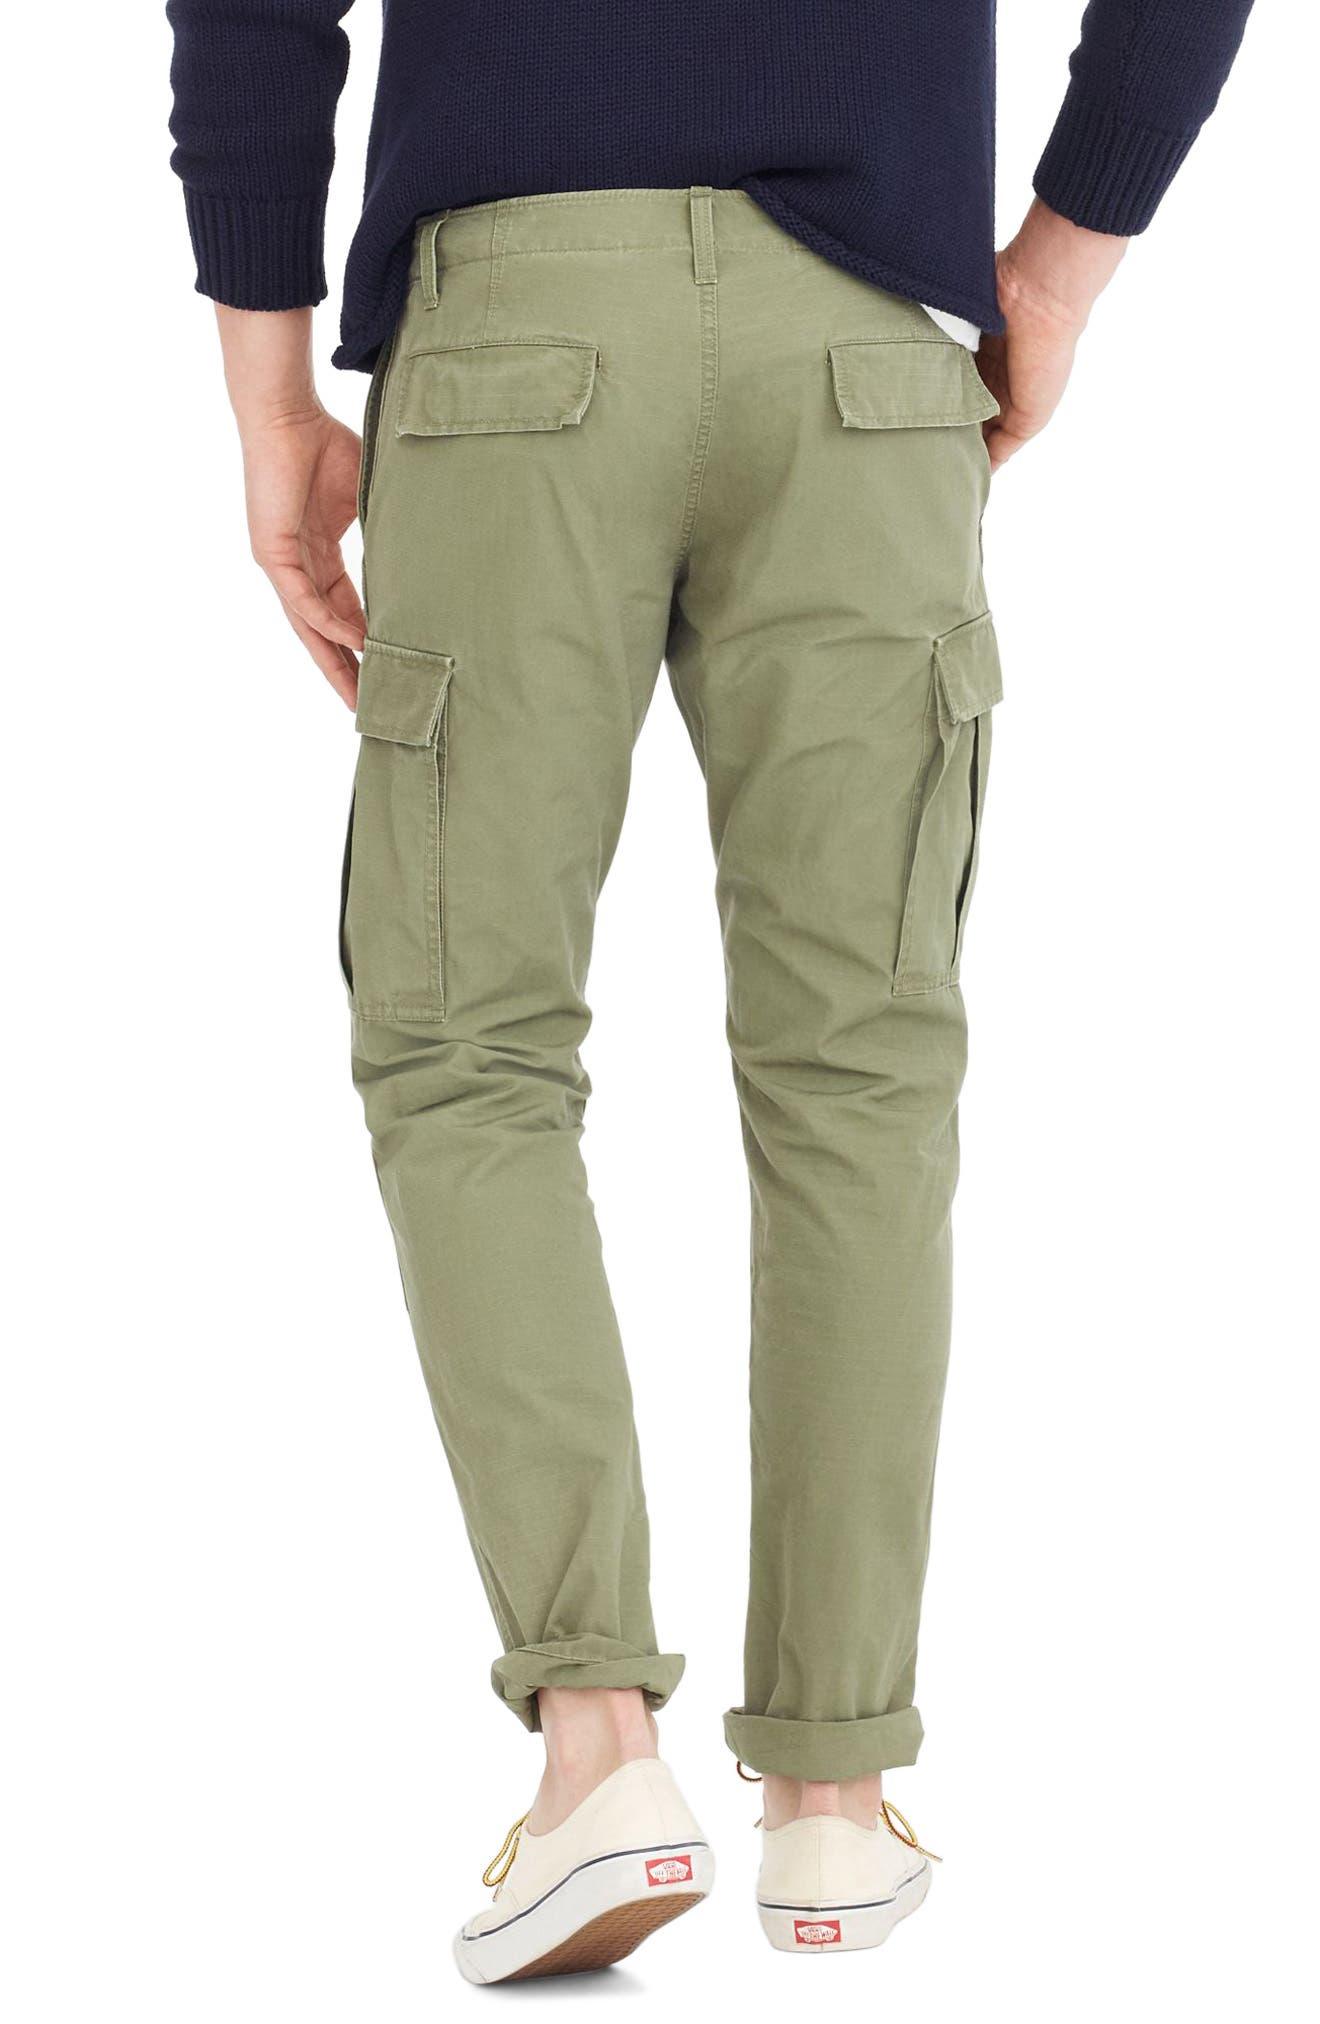 Alternate Image 2  - J.Crew 770 Straight Fit Ripstop Cargo Pants